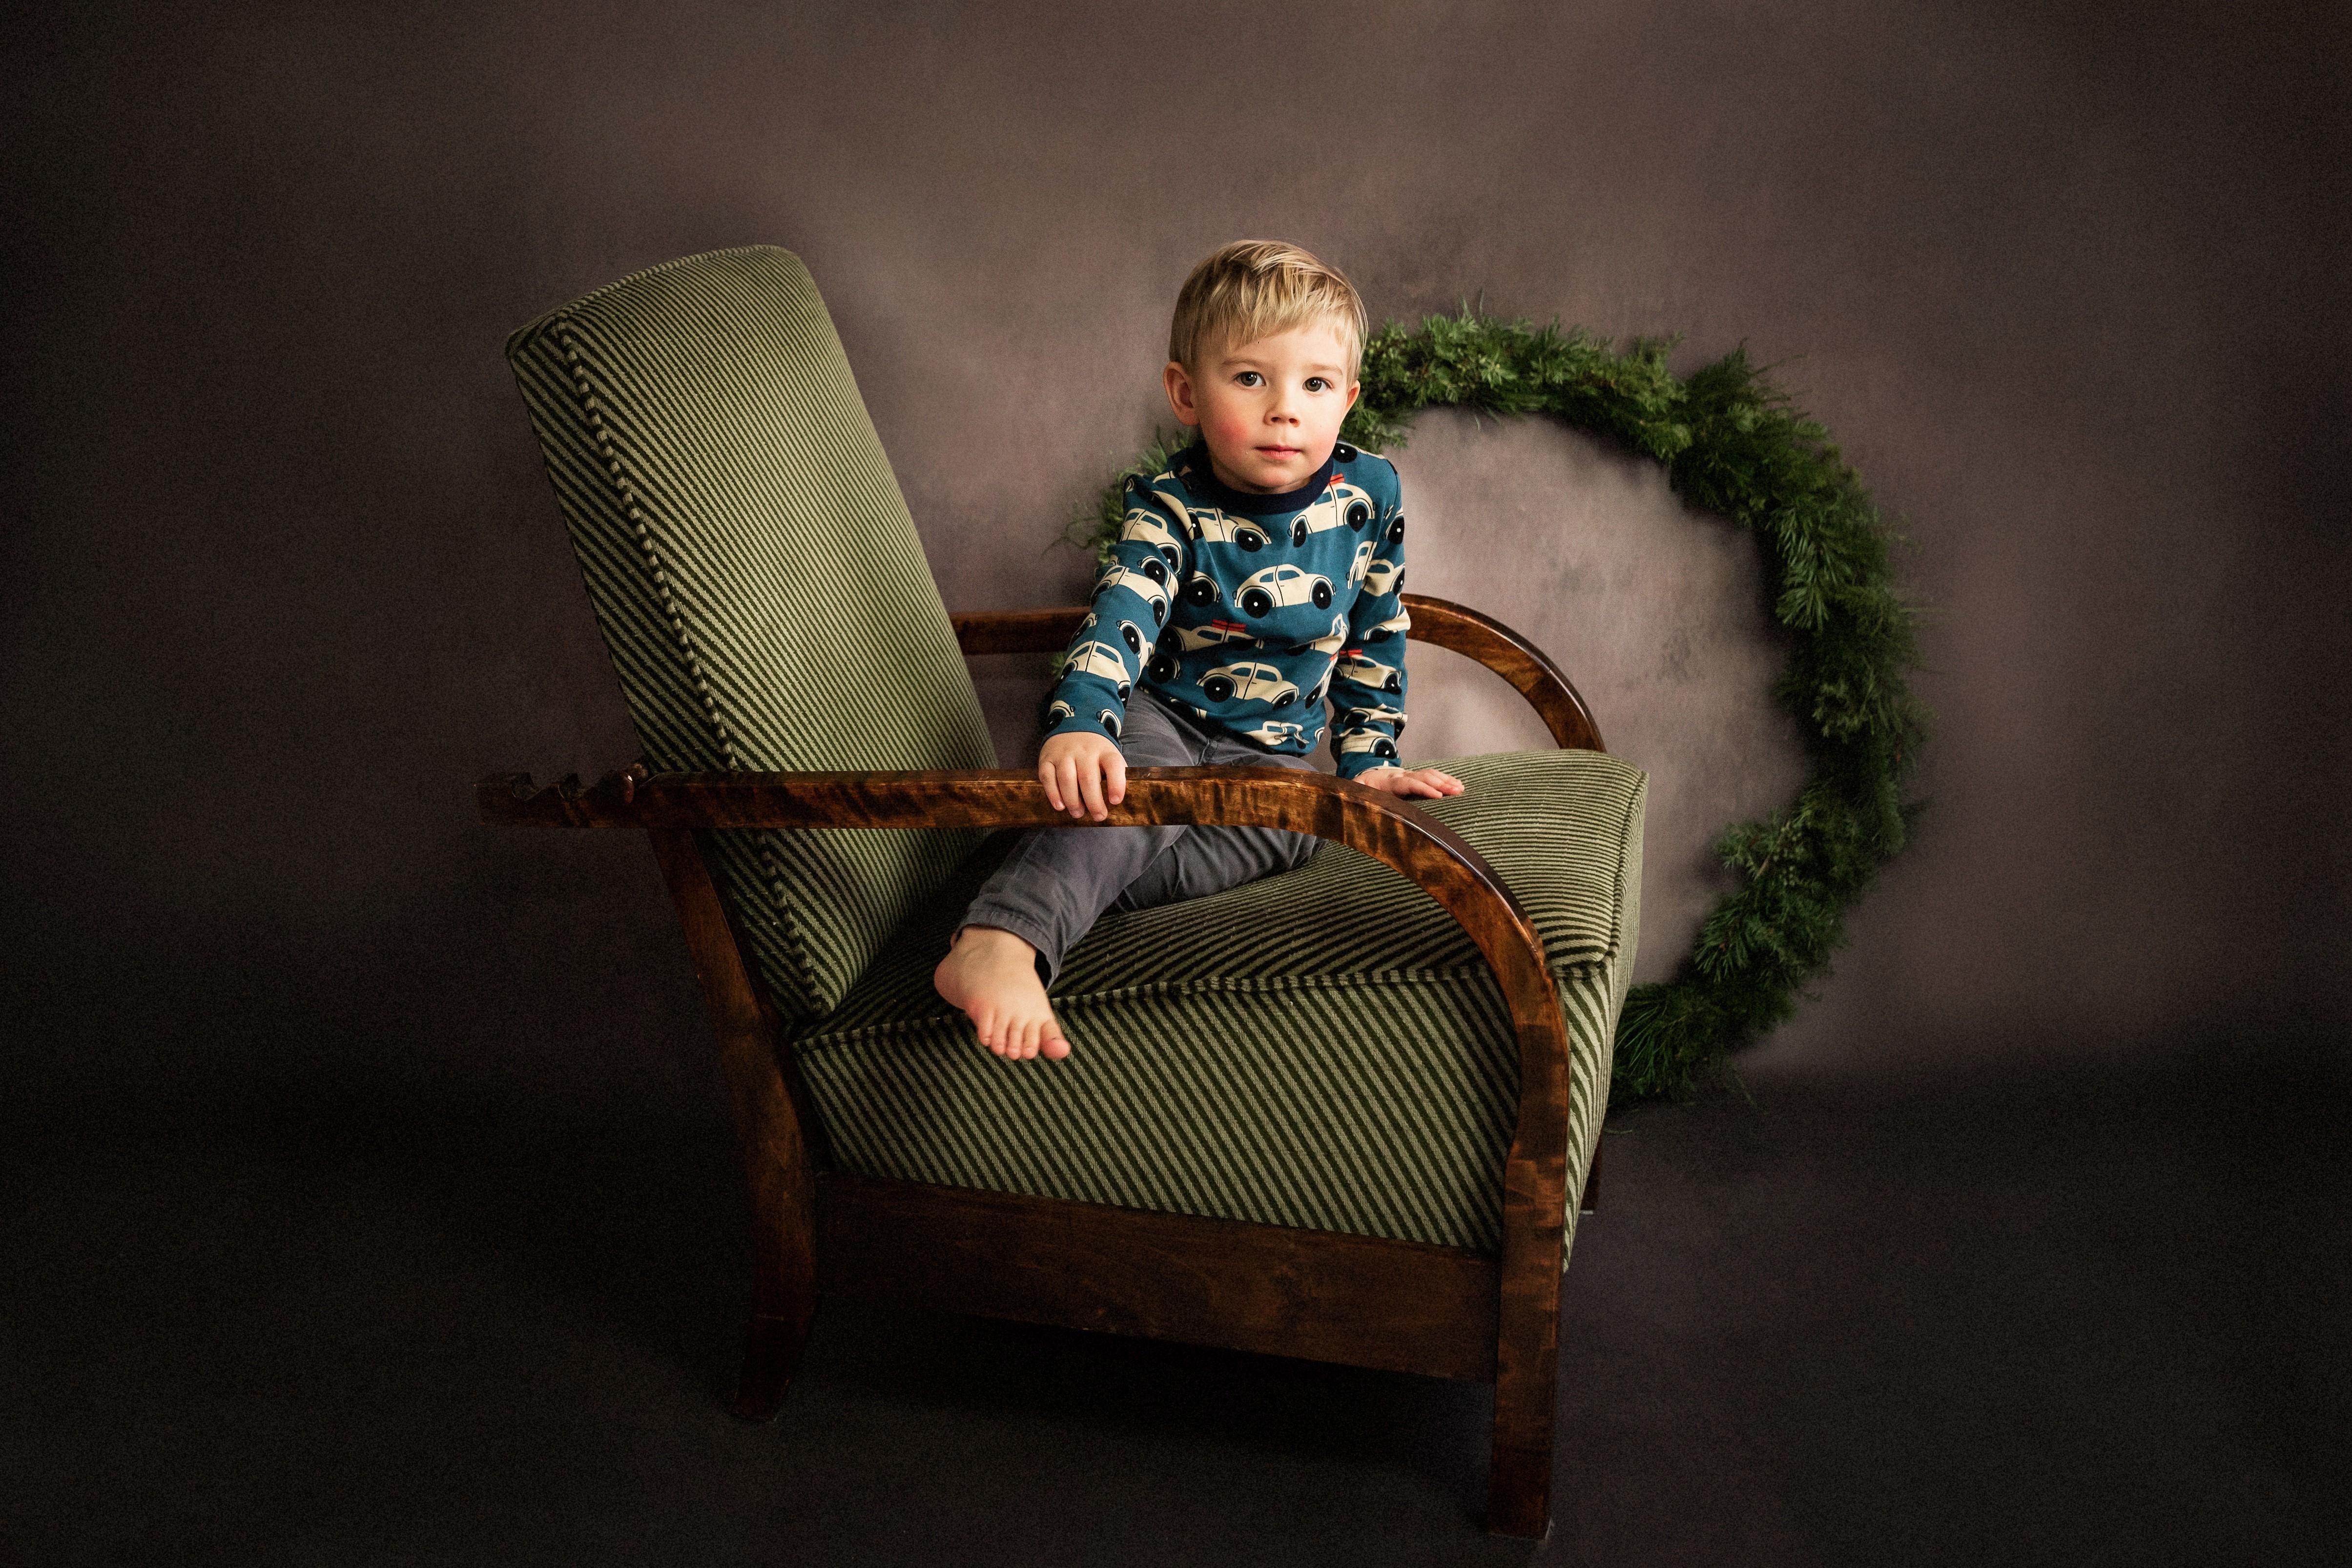 Studio portrait of boy sitting in chair